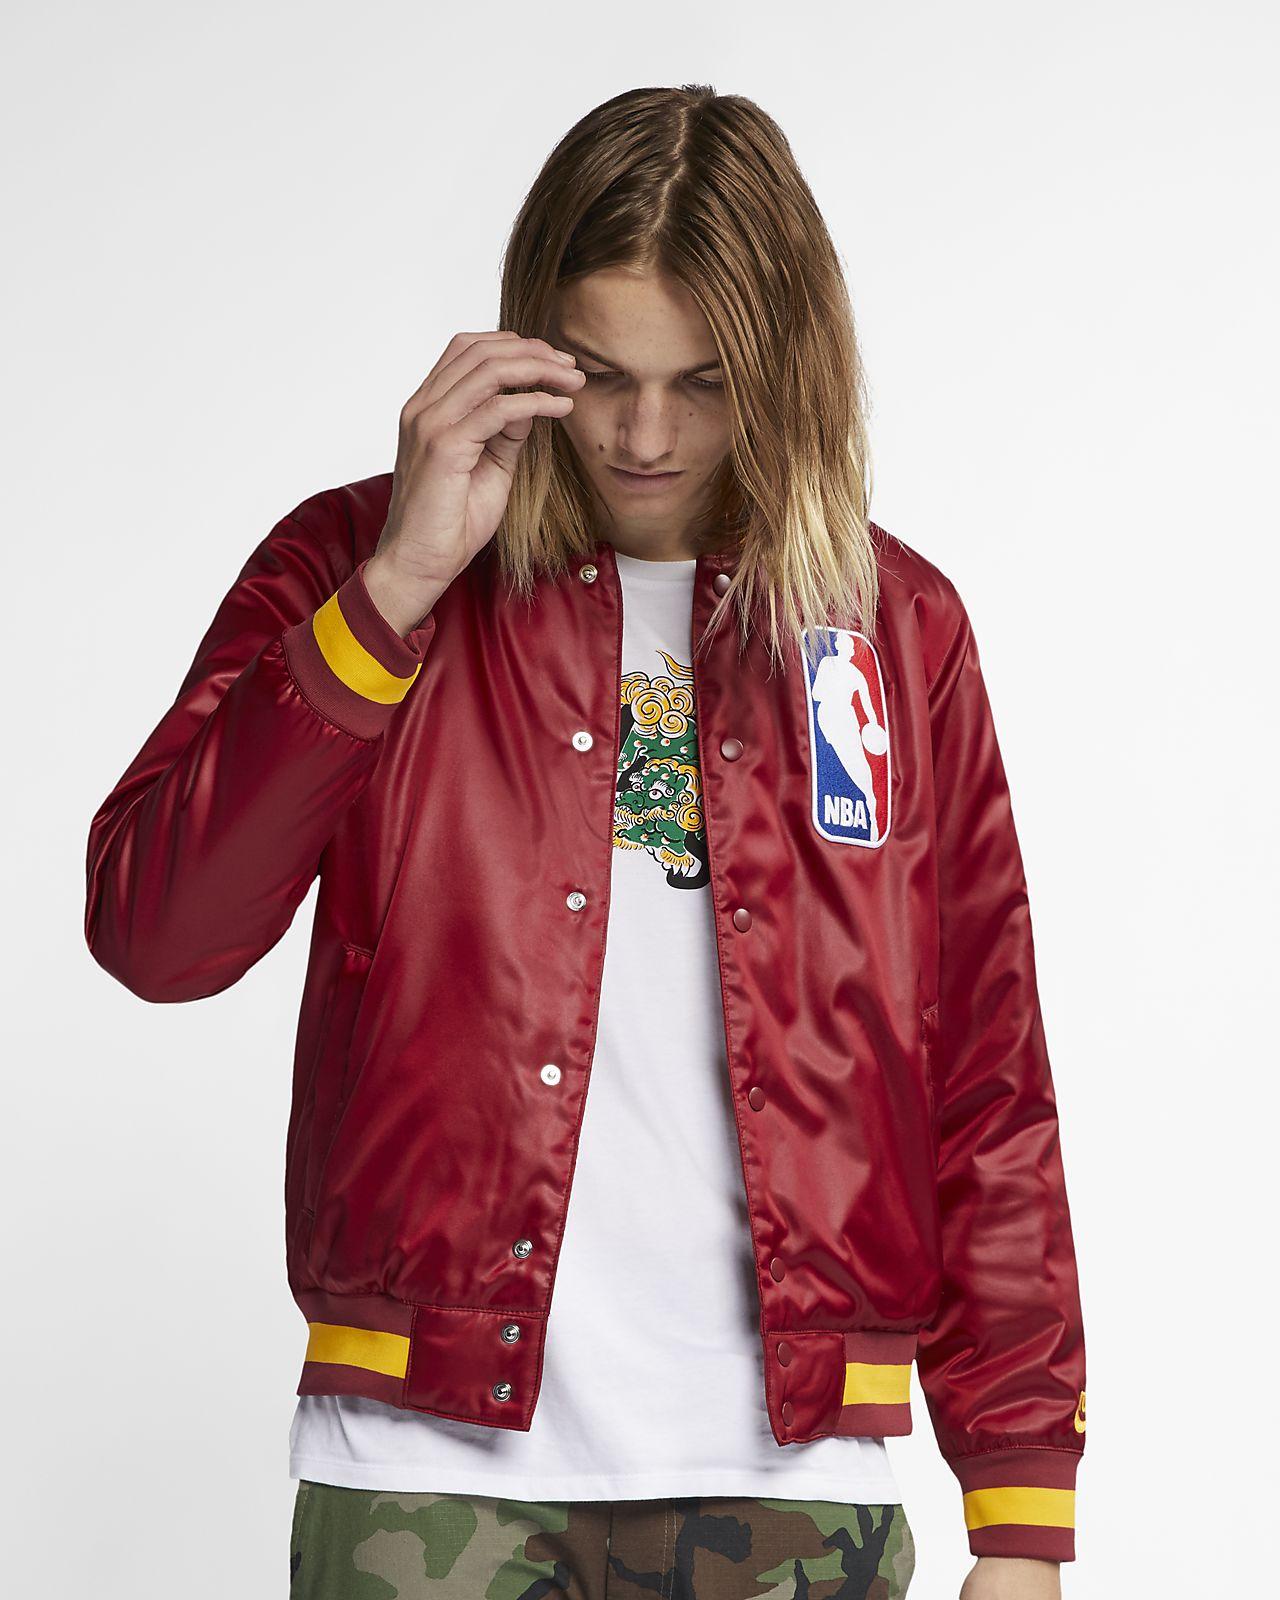 Nike SB x NBA Erkek Bomber Ceket